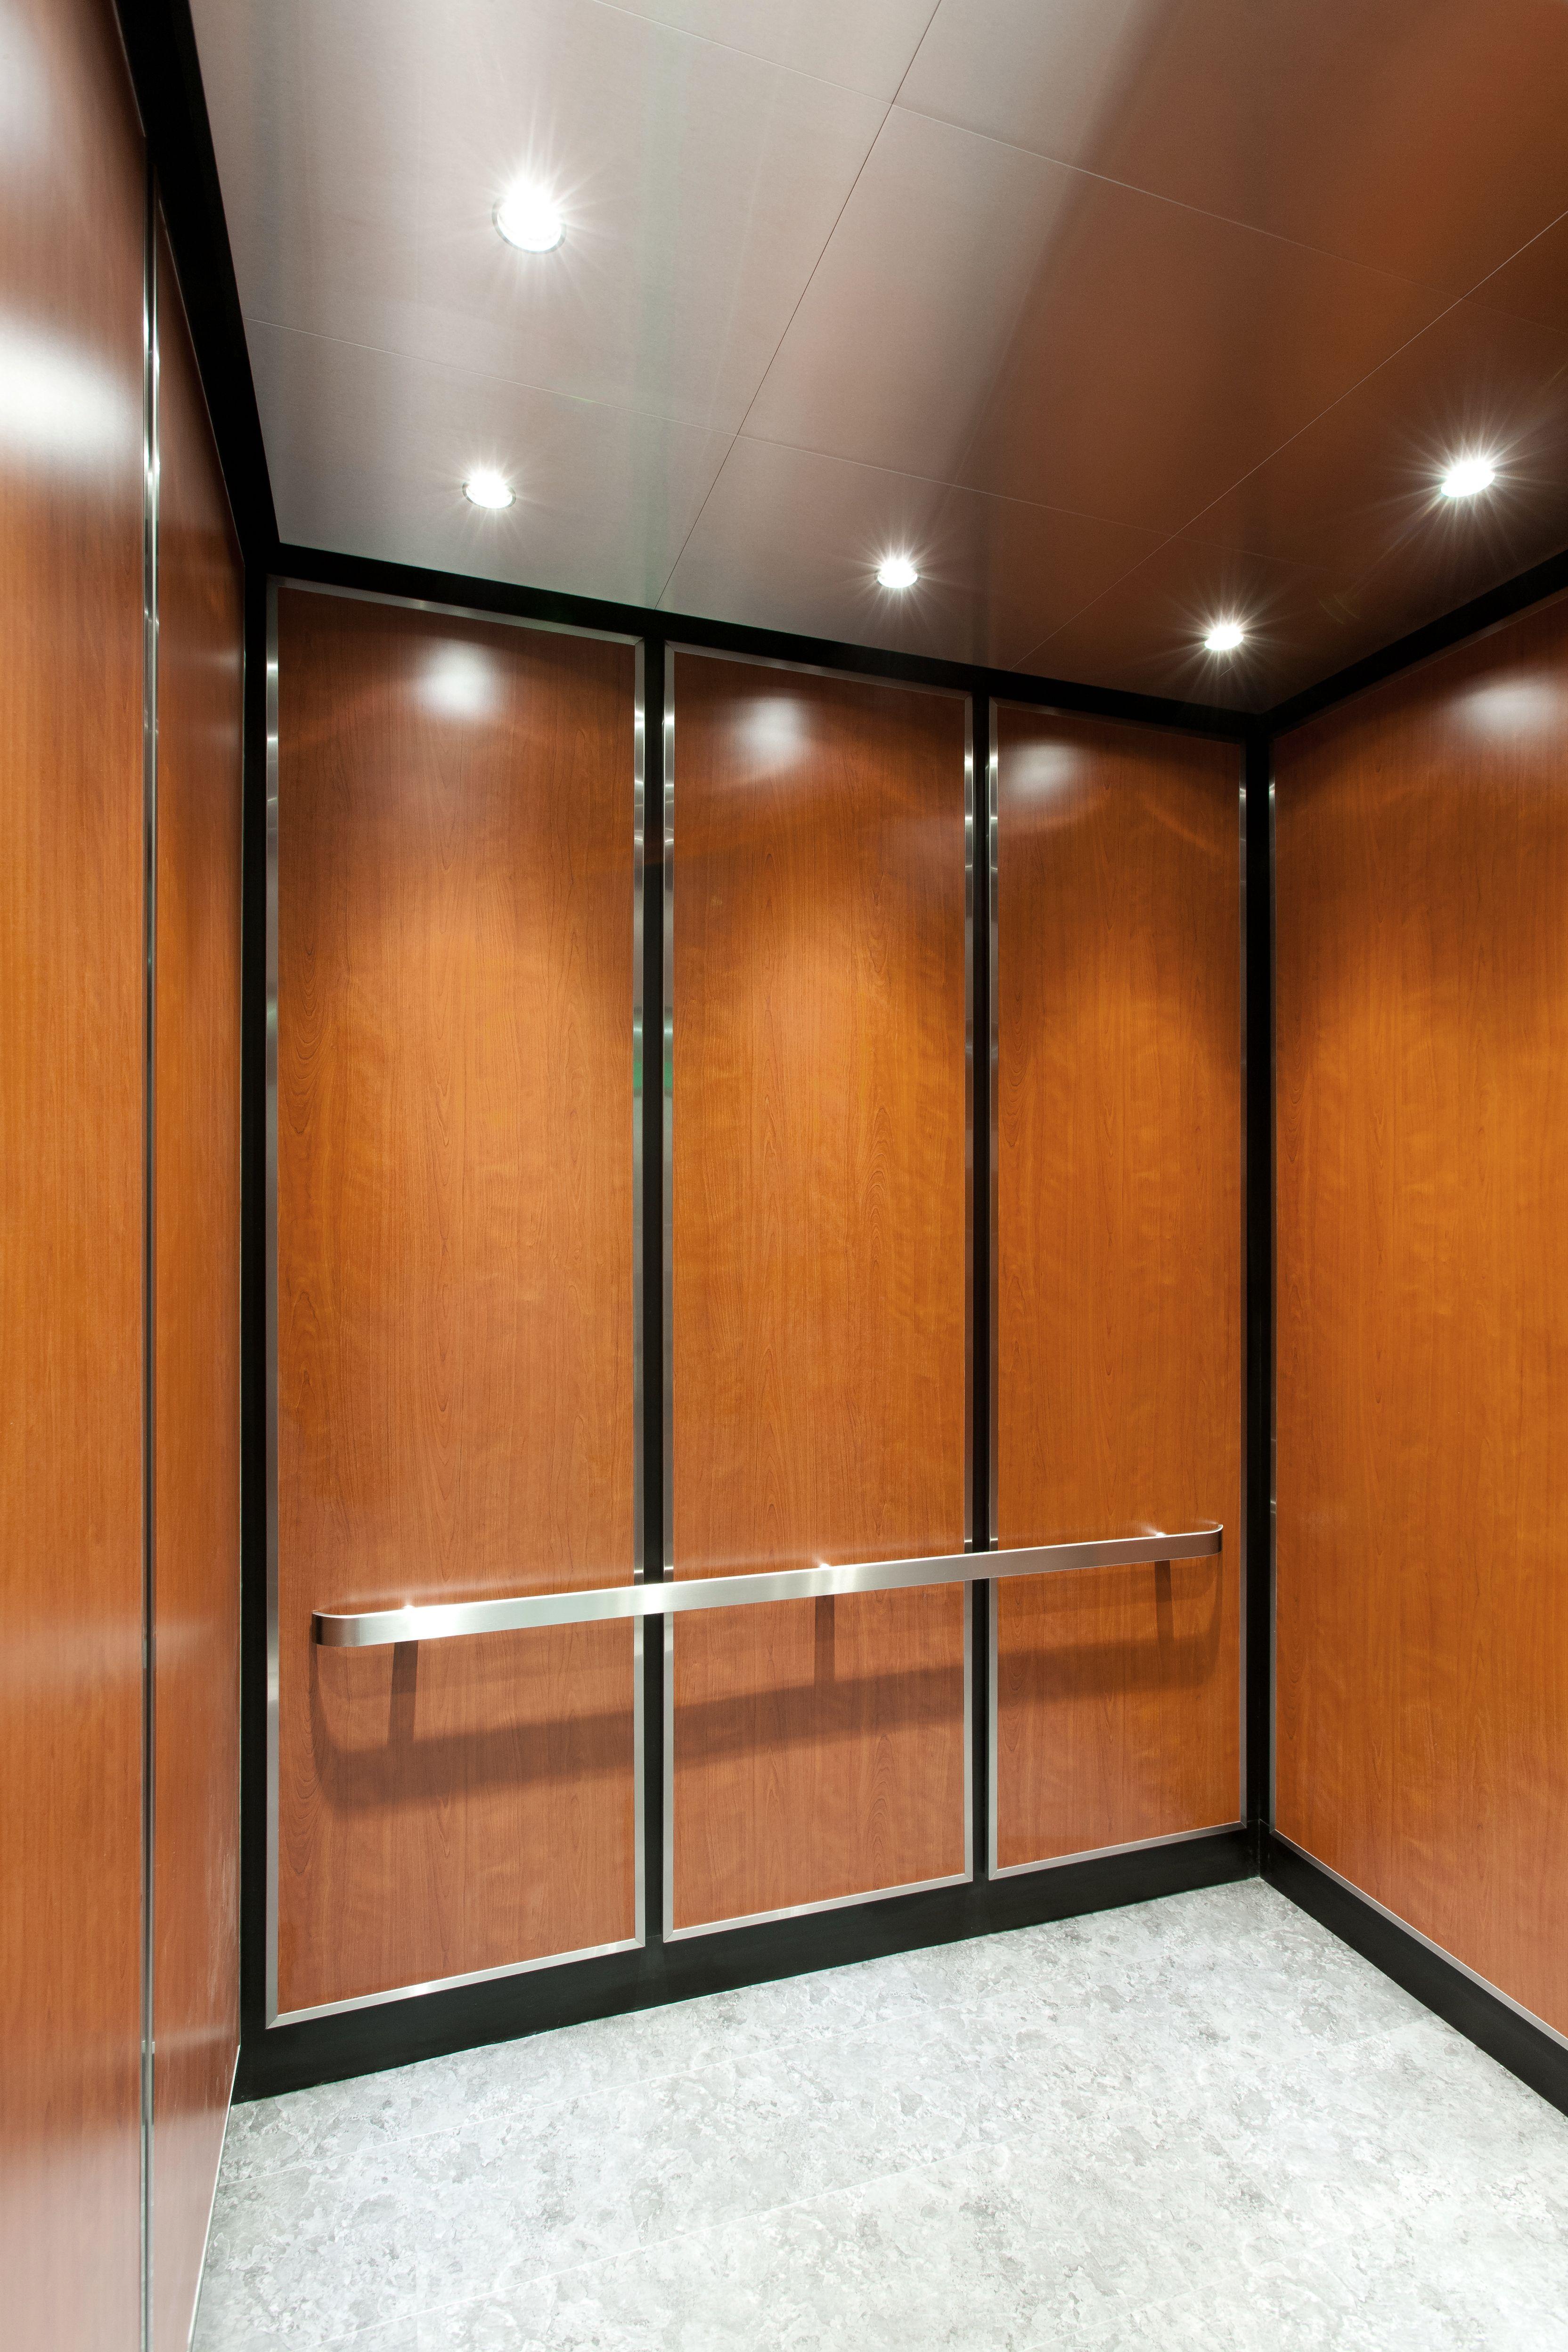 Chesapeake Elevator Interiors Inc Wood Grain Plastic